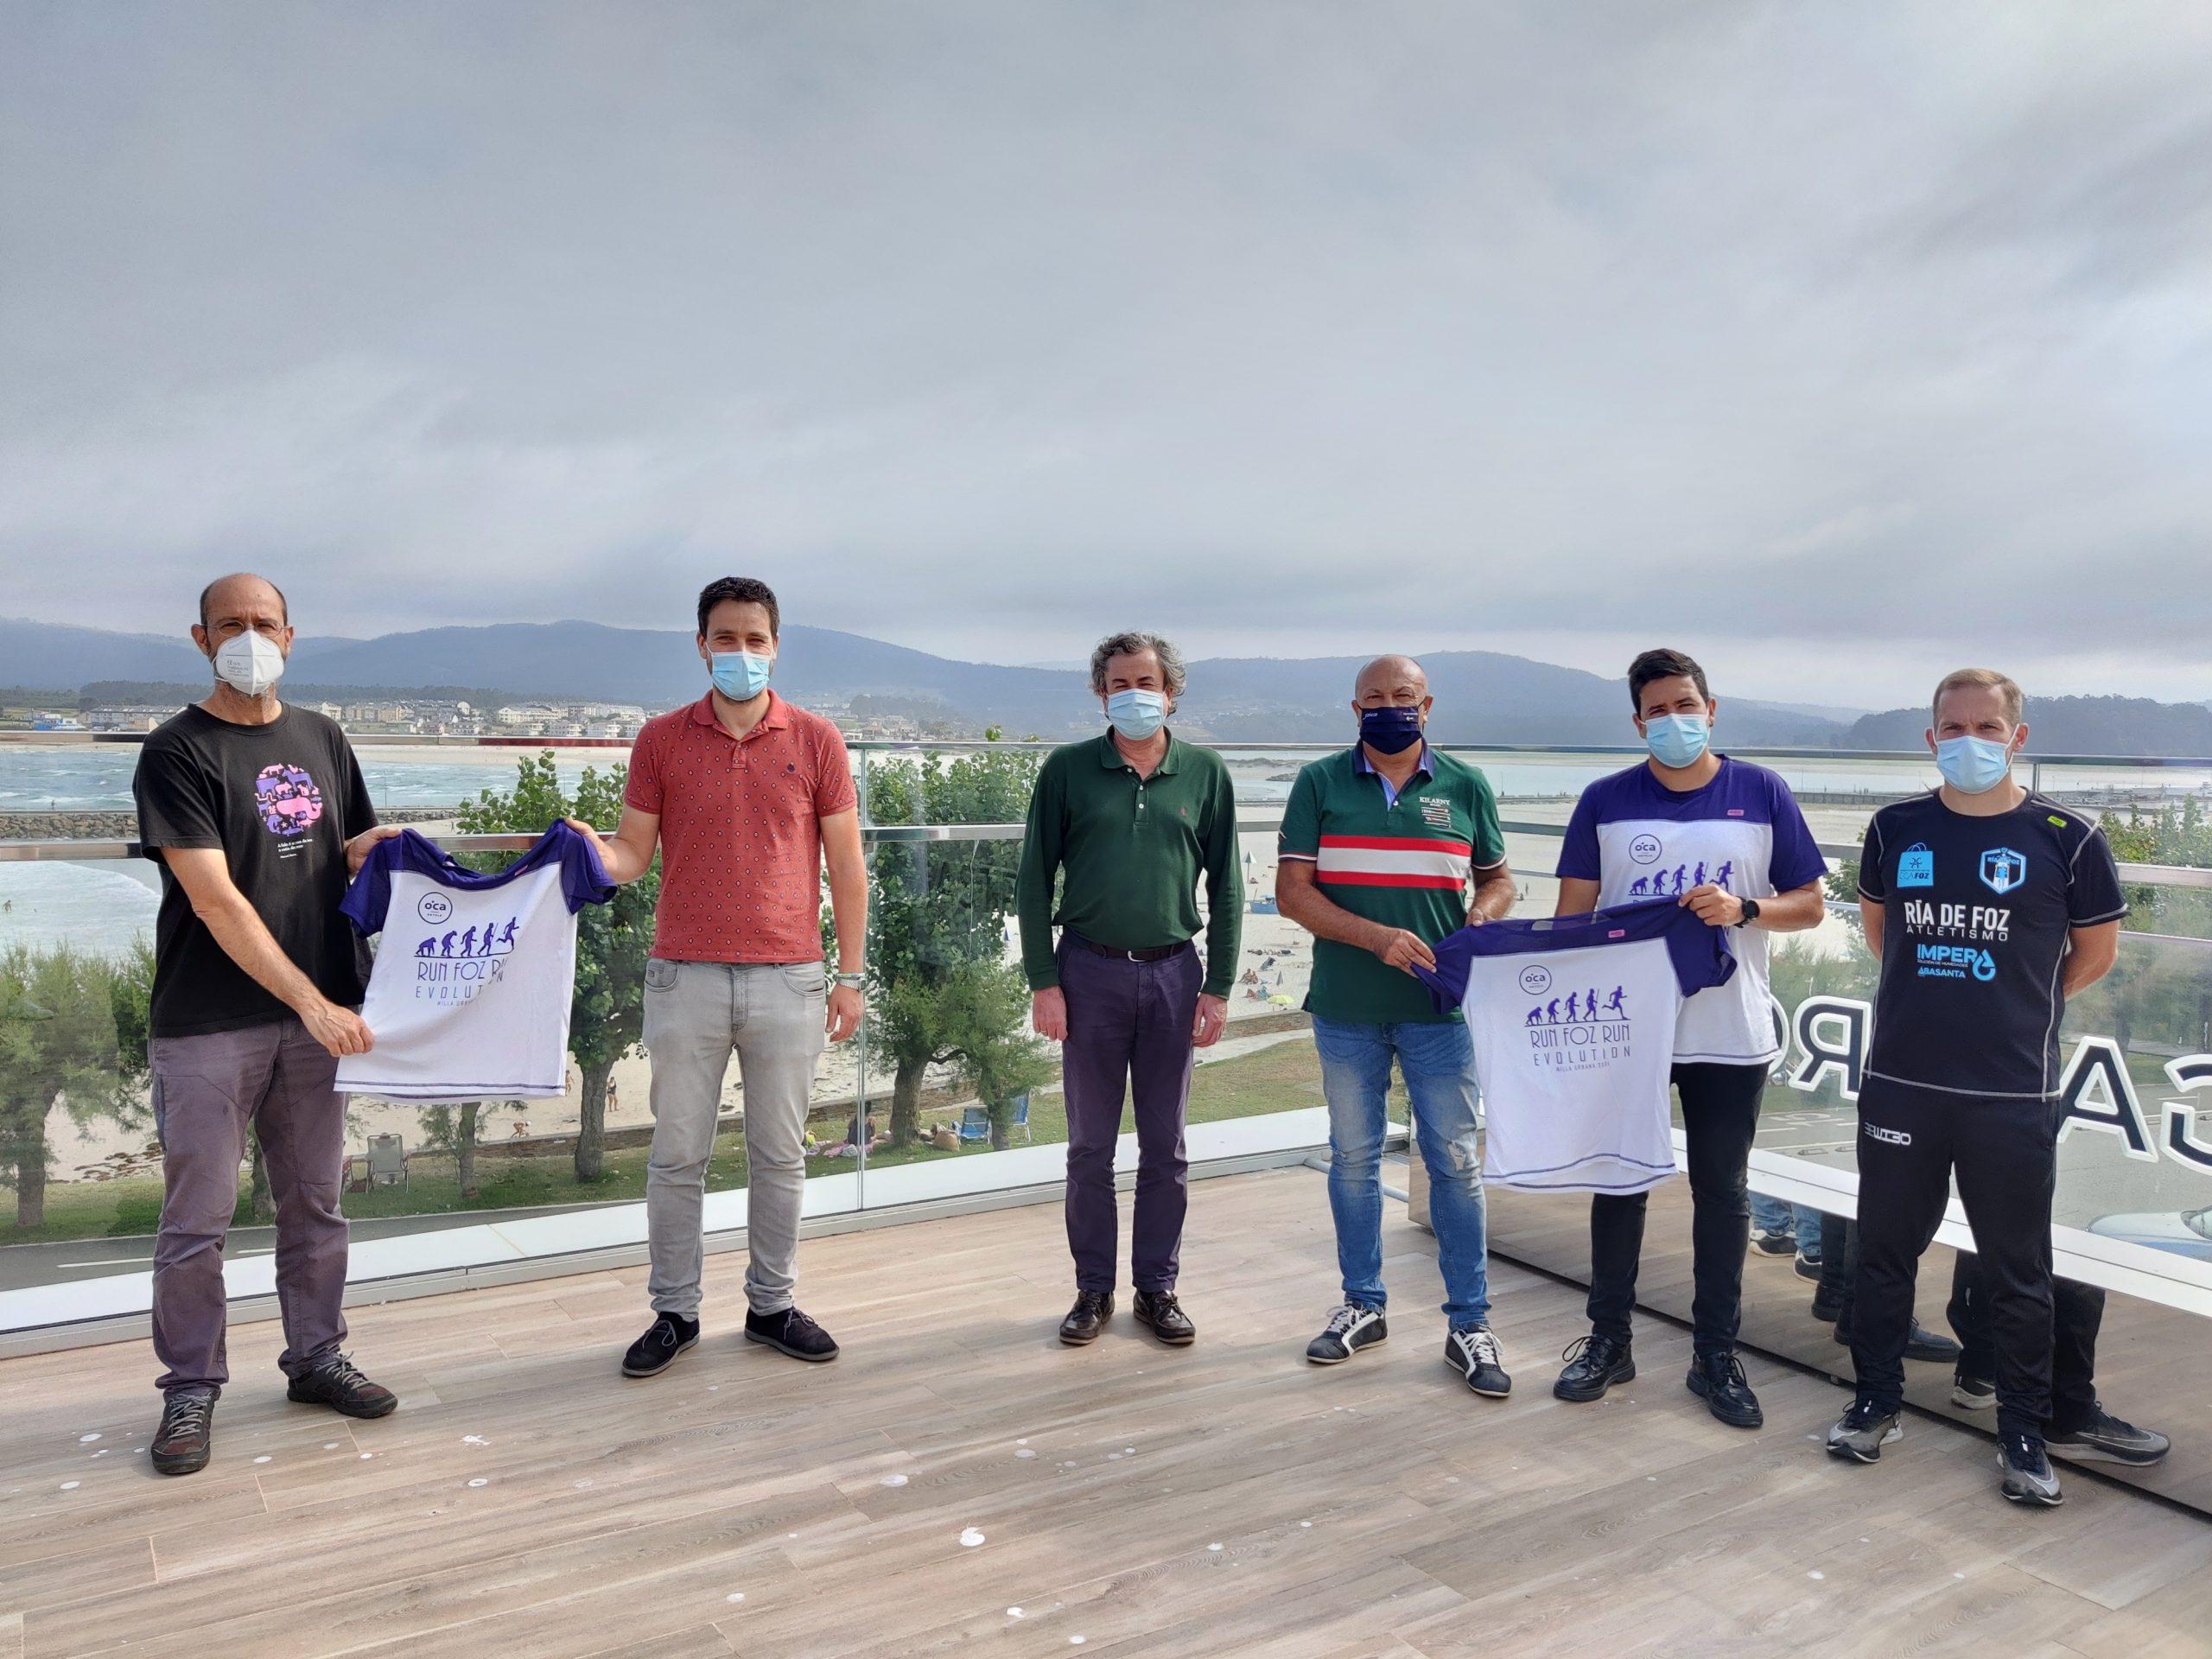 A 'Milla Urbana e Relevos Challenge' celebrarase o 11 de setembro nos arredores do Oca Hotel de Foz